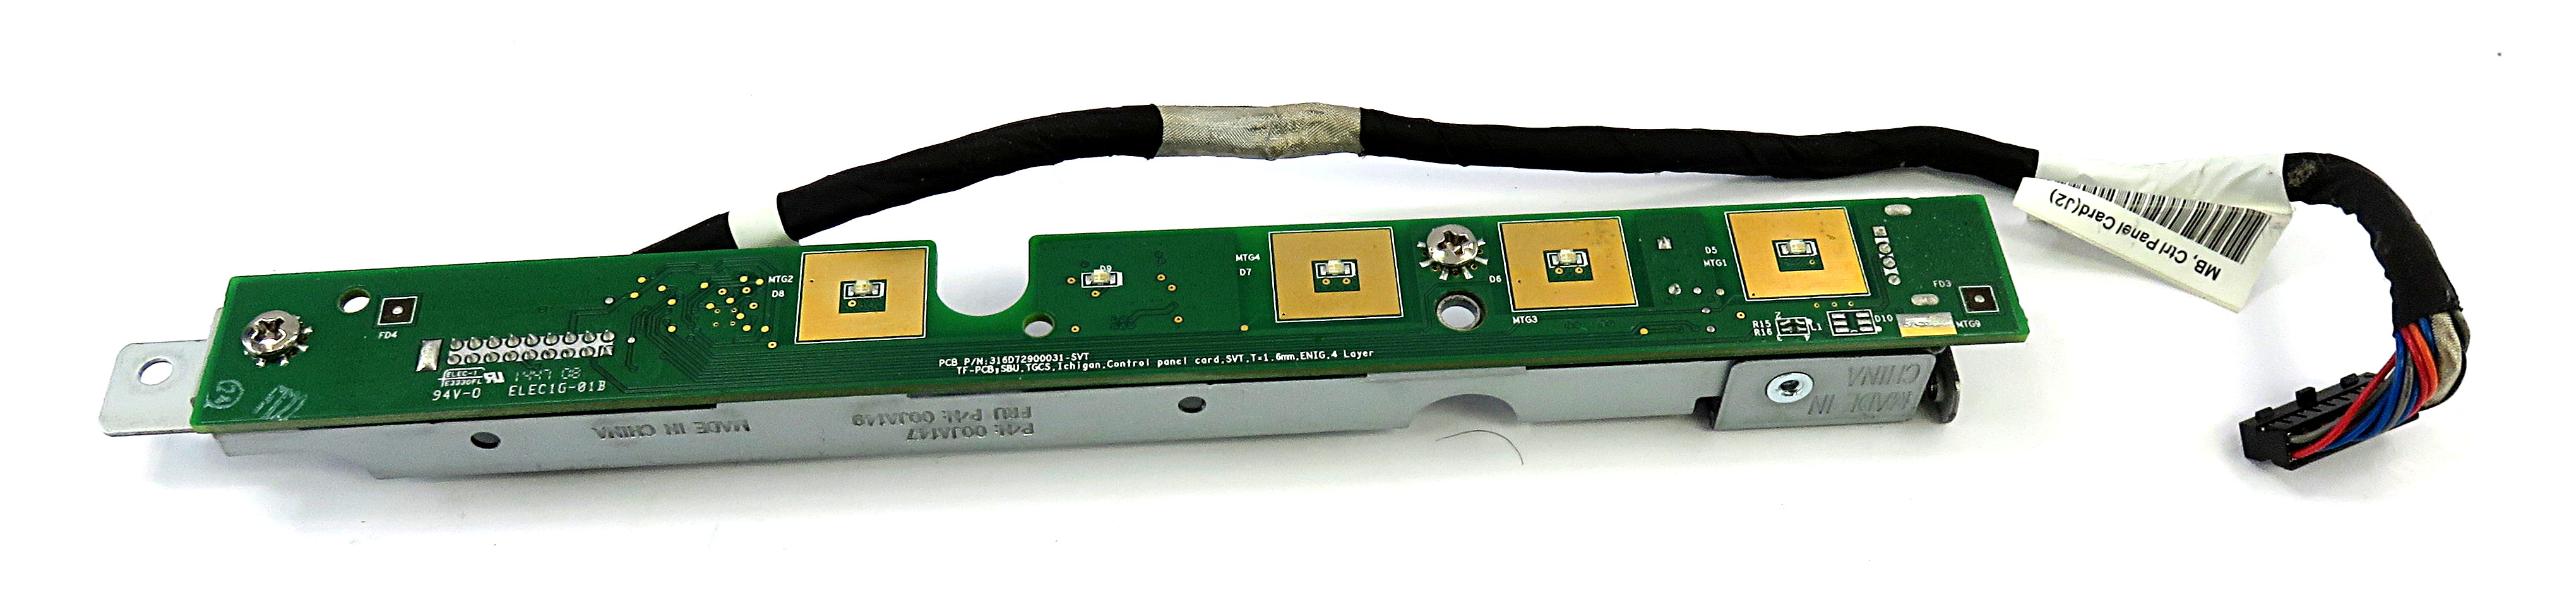 Lenovo 00JA149 Control Panel Card f/ Toshiba TCxWave 6140-E3R EPOS Terminal